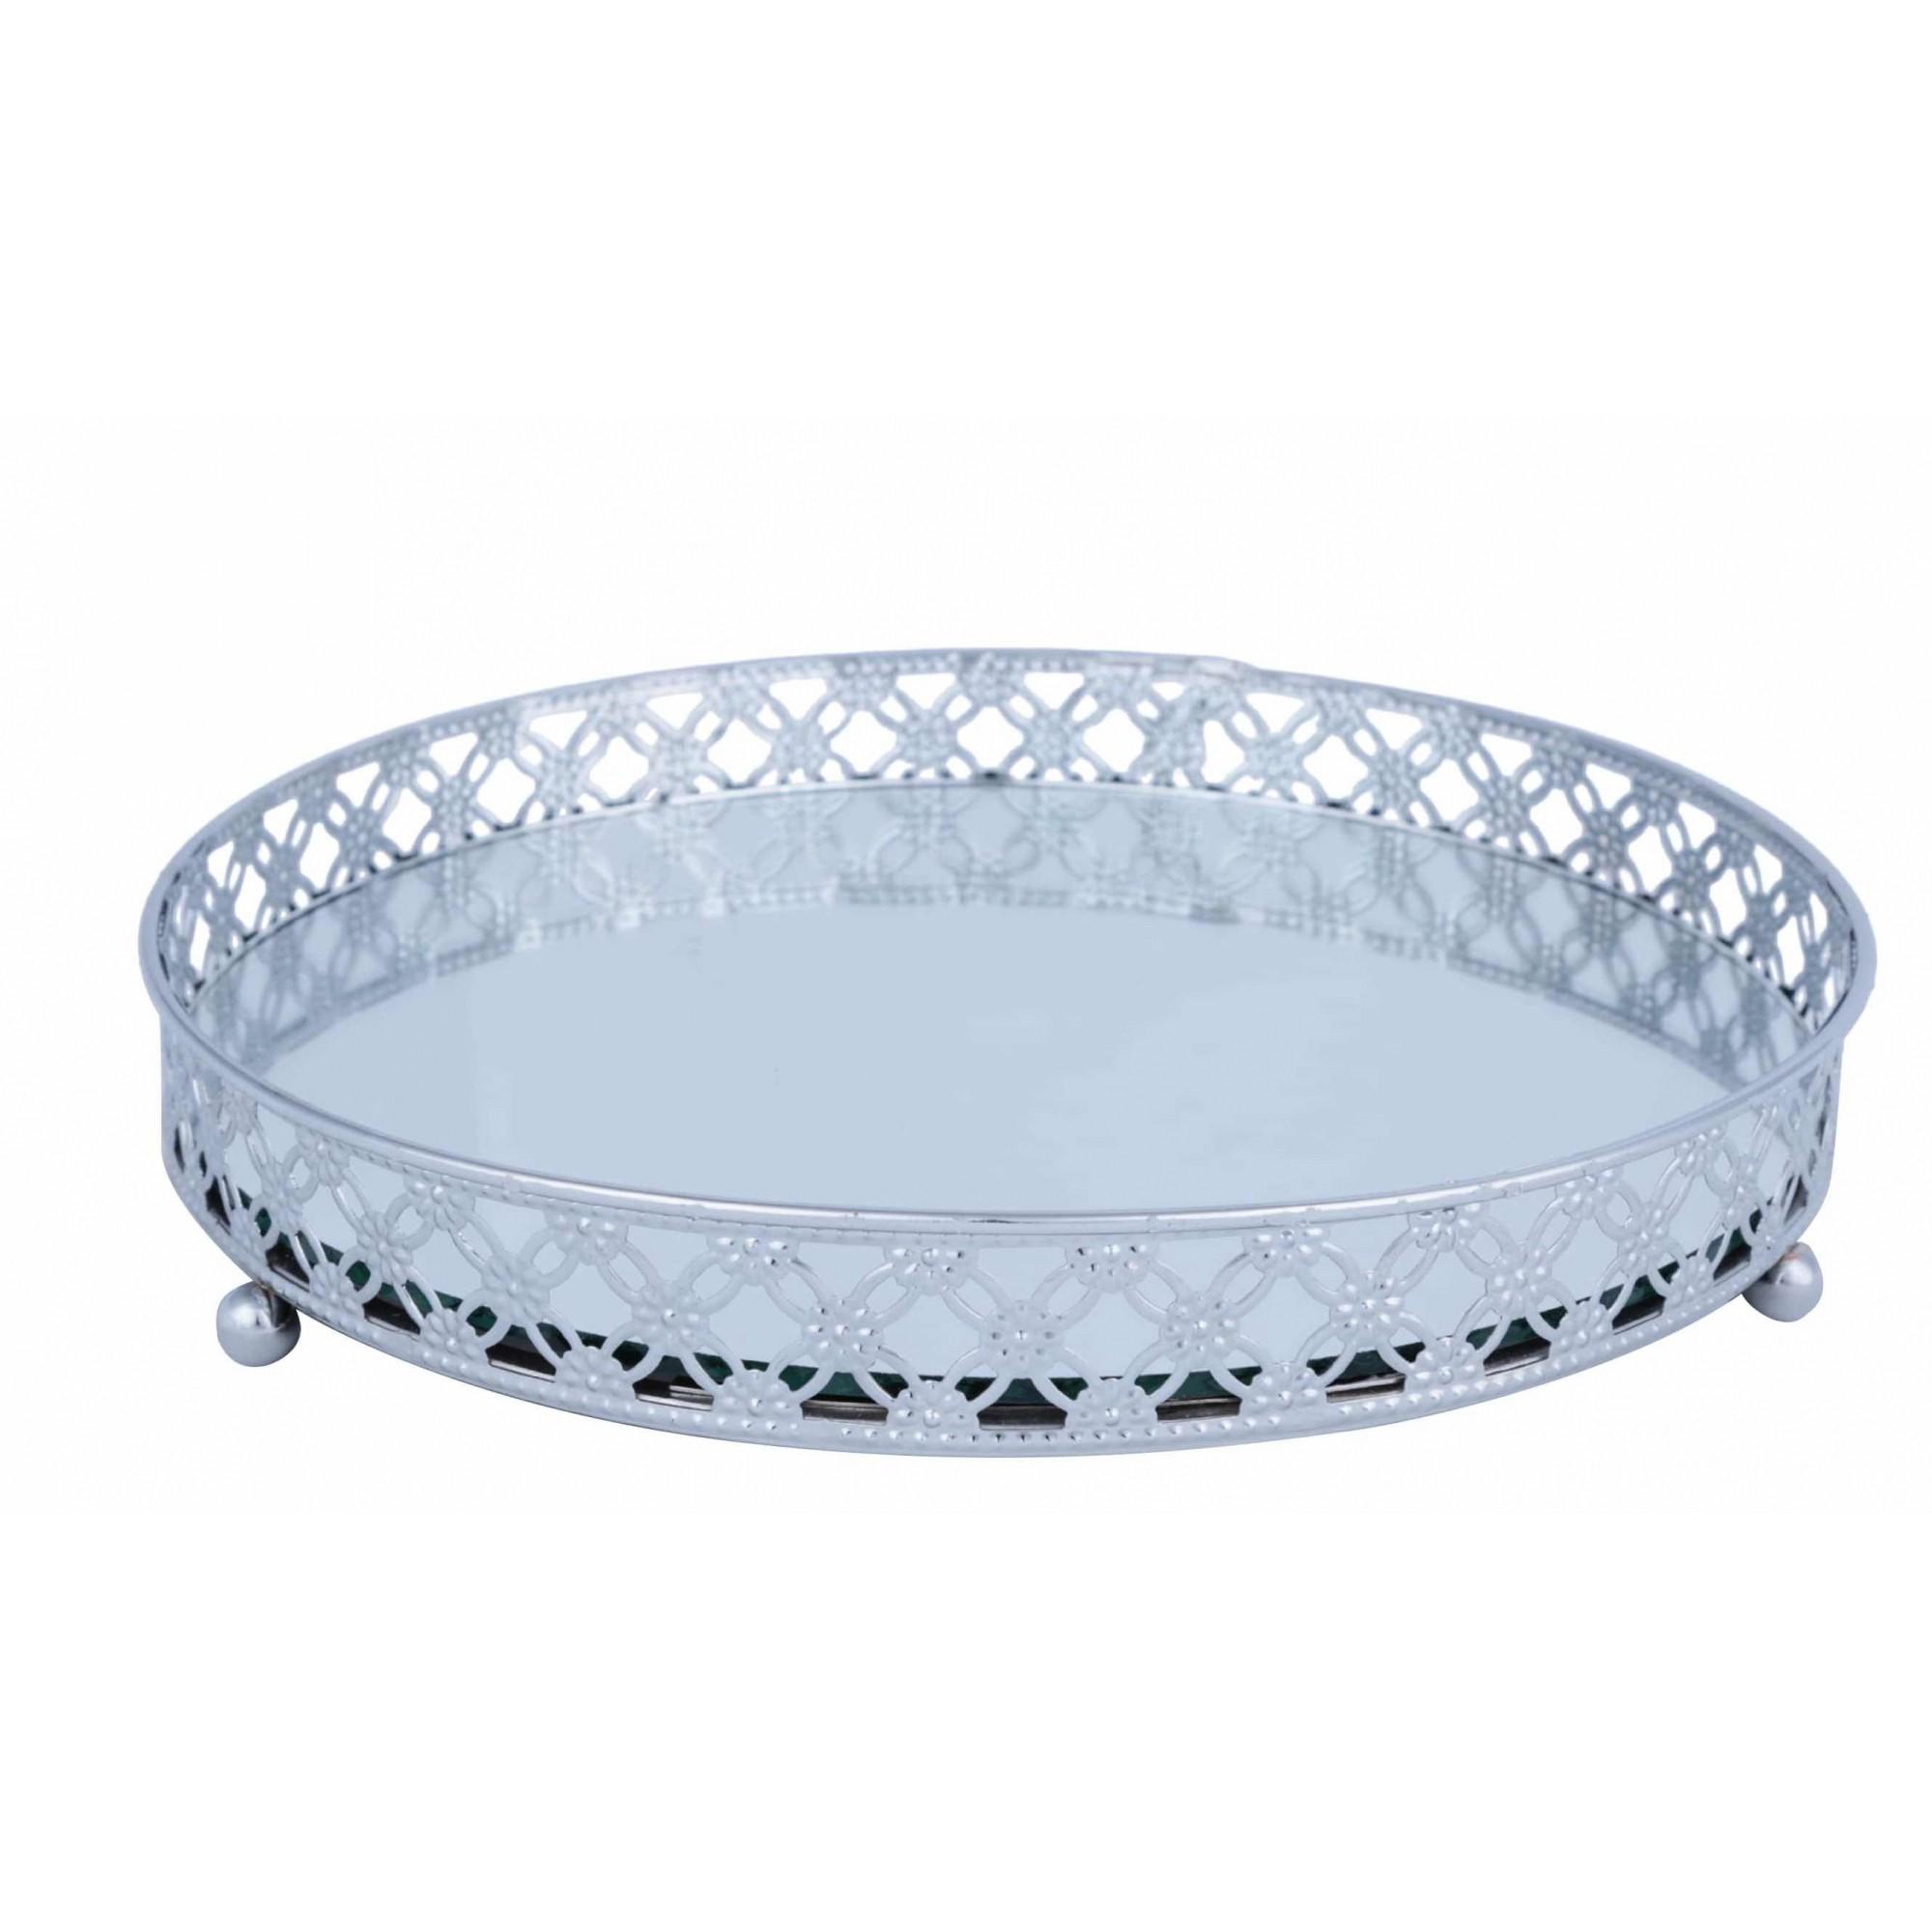 Bandeja Espelhada Metal Prata Redonda Luxo para Lavabo / Bar / Sala 25x25x3,7cm